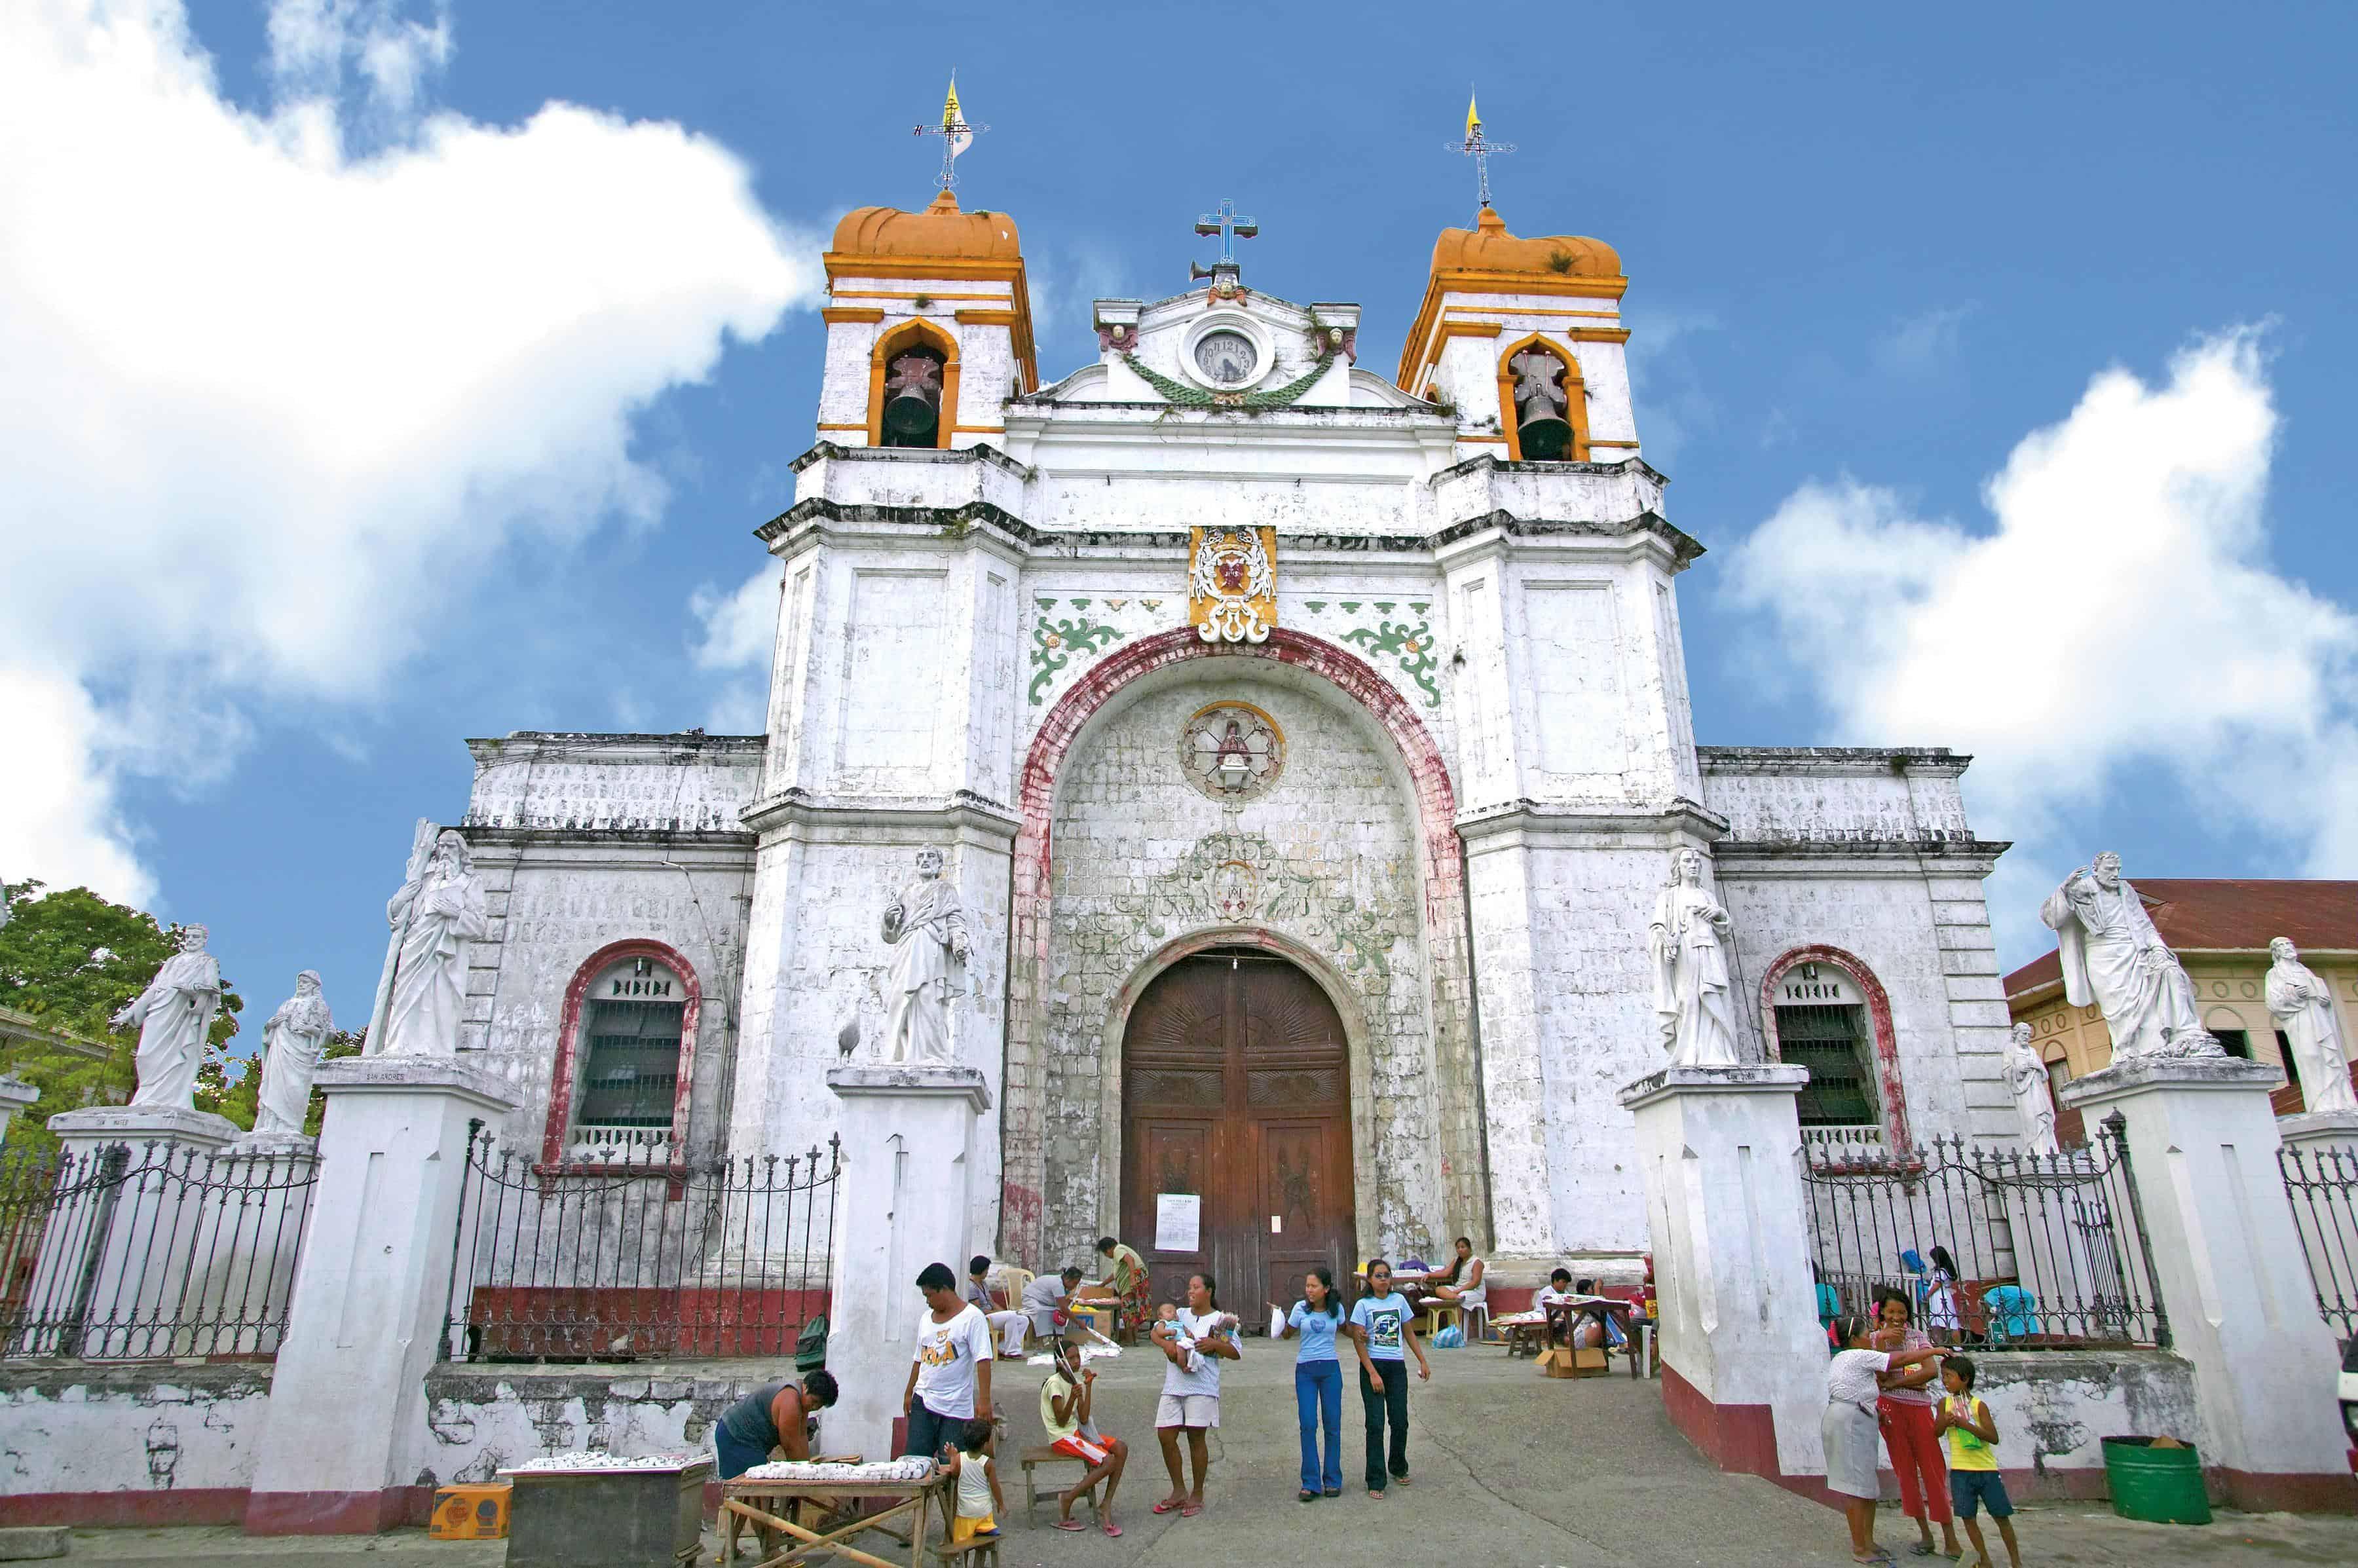 saintcatherinecarcar-visitmyphilippines.com